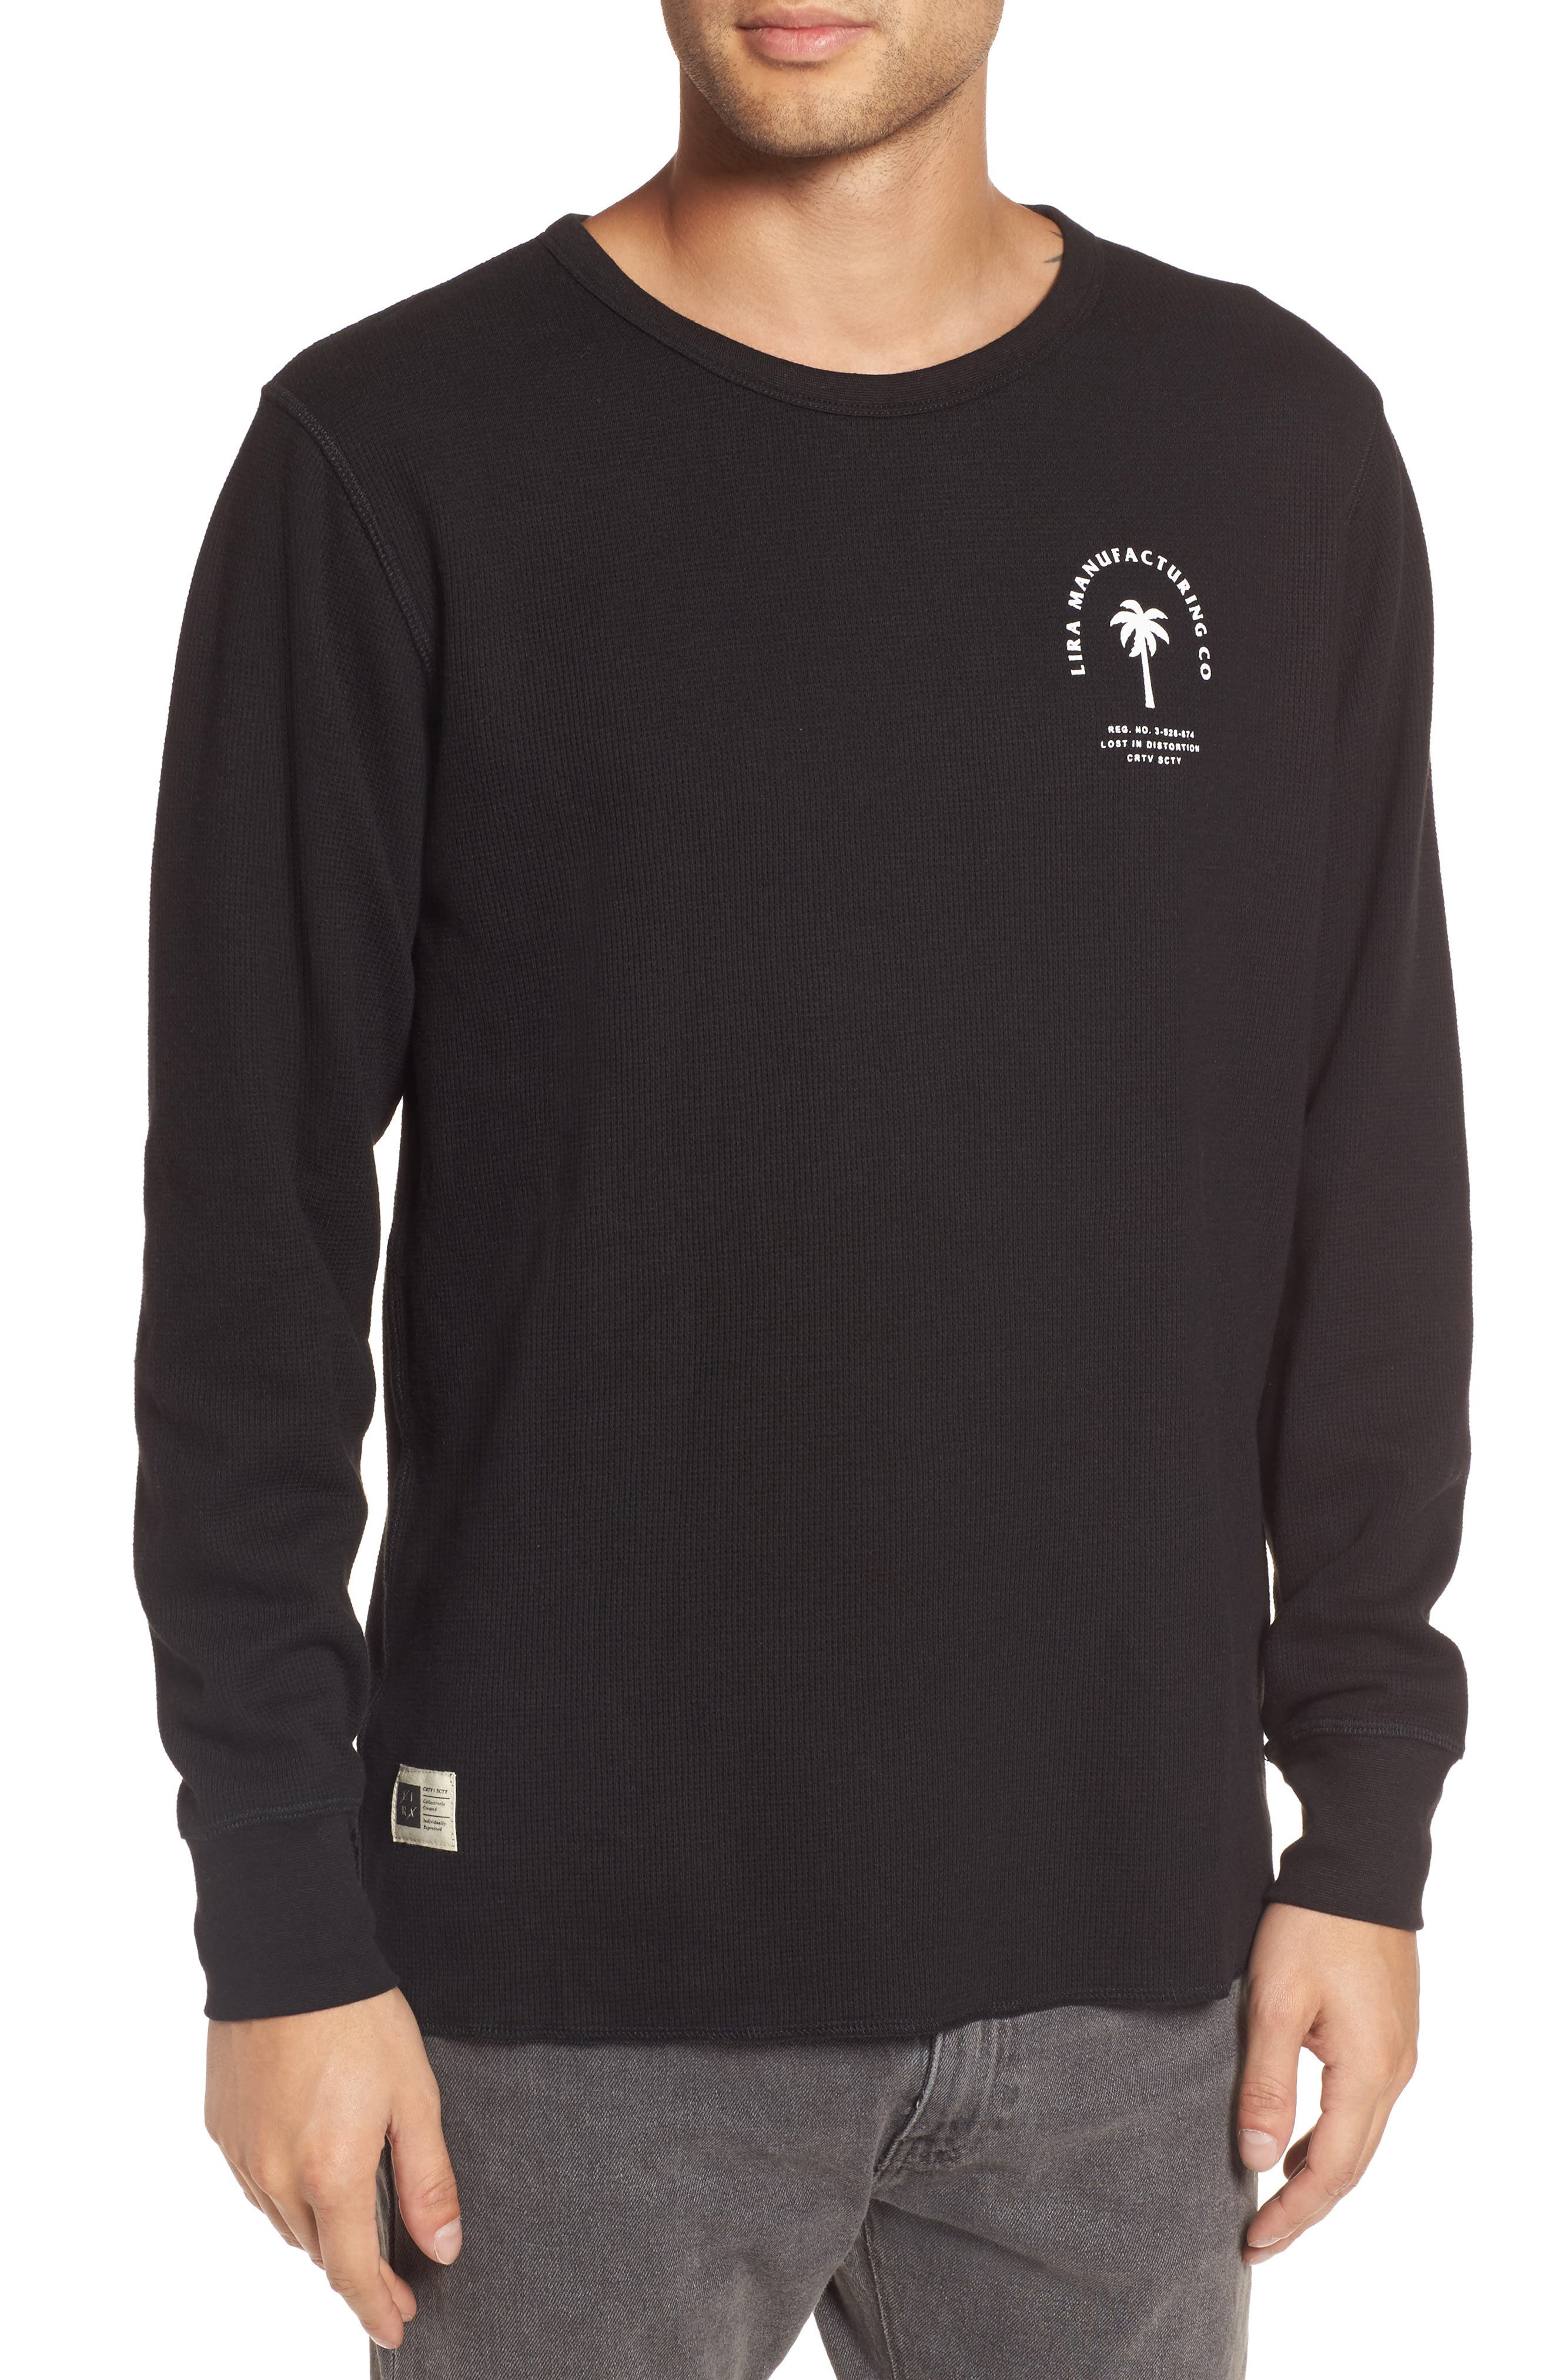 Alternate Image 1 Selected - Lira Clothing Cochino Thermal T-shirt